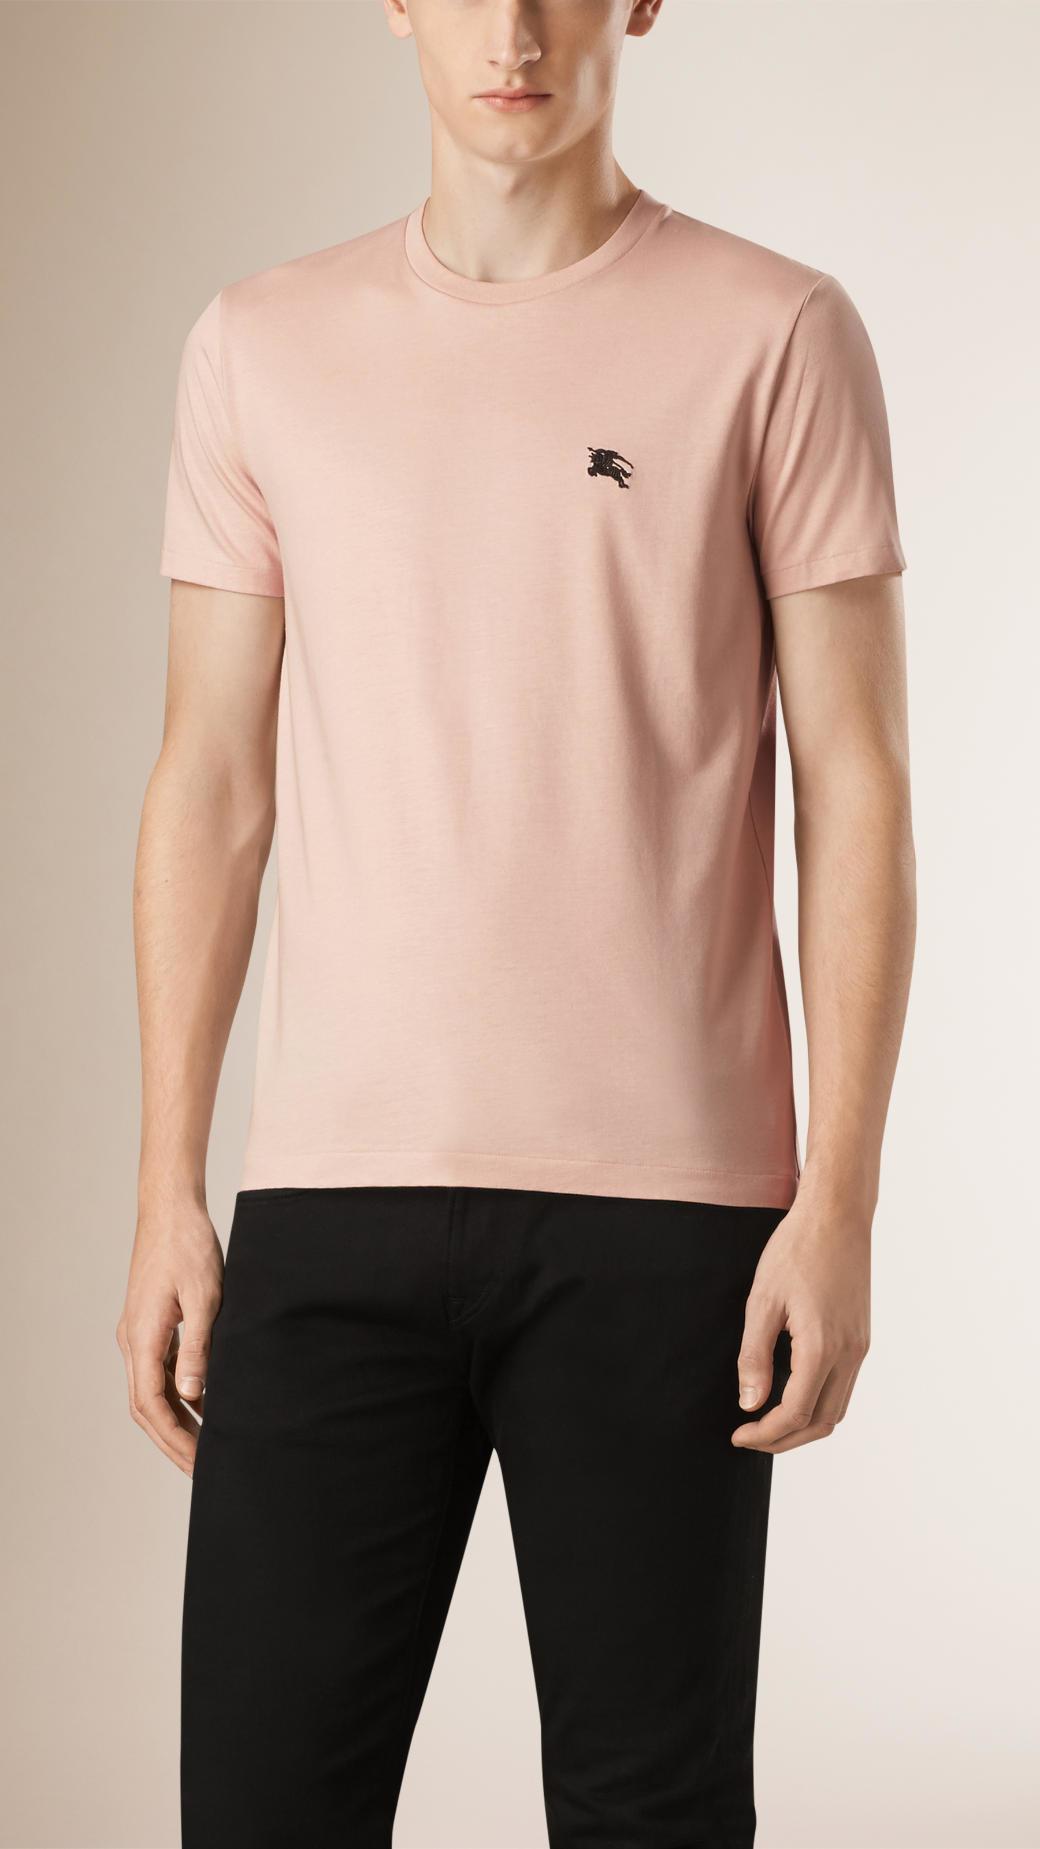 Burberry liquid soft cotton t shirt in beige for men for Soft cotton dress shirts